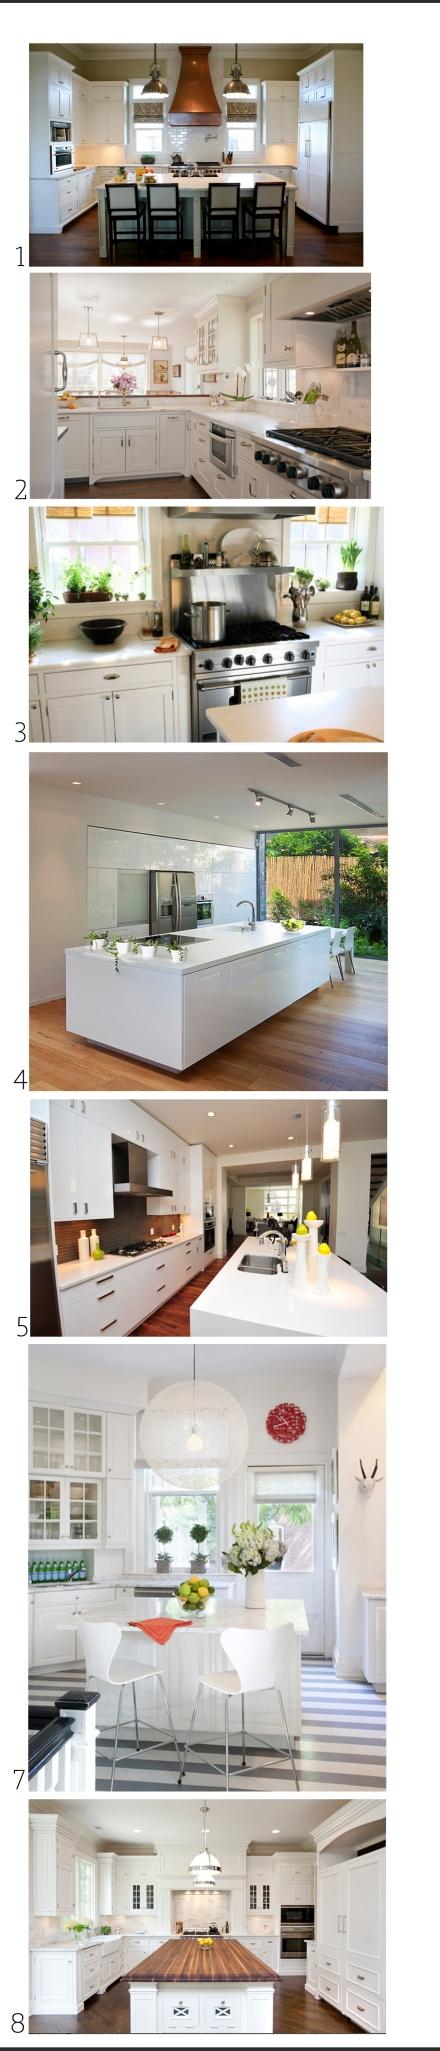 white-kitchen-with-white-countertops copy